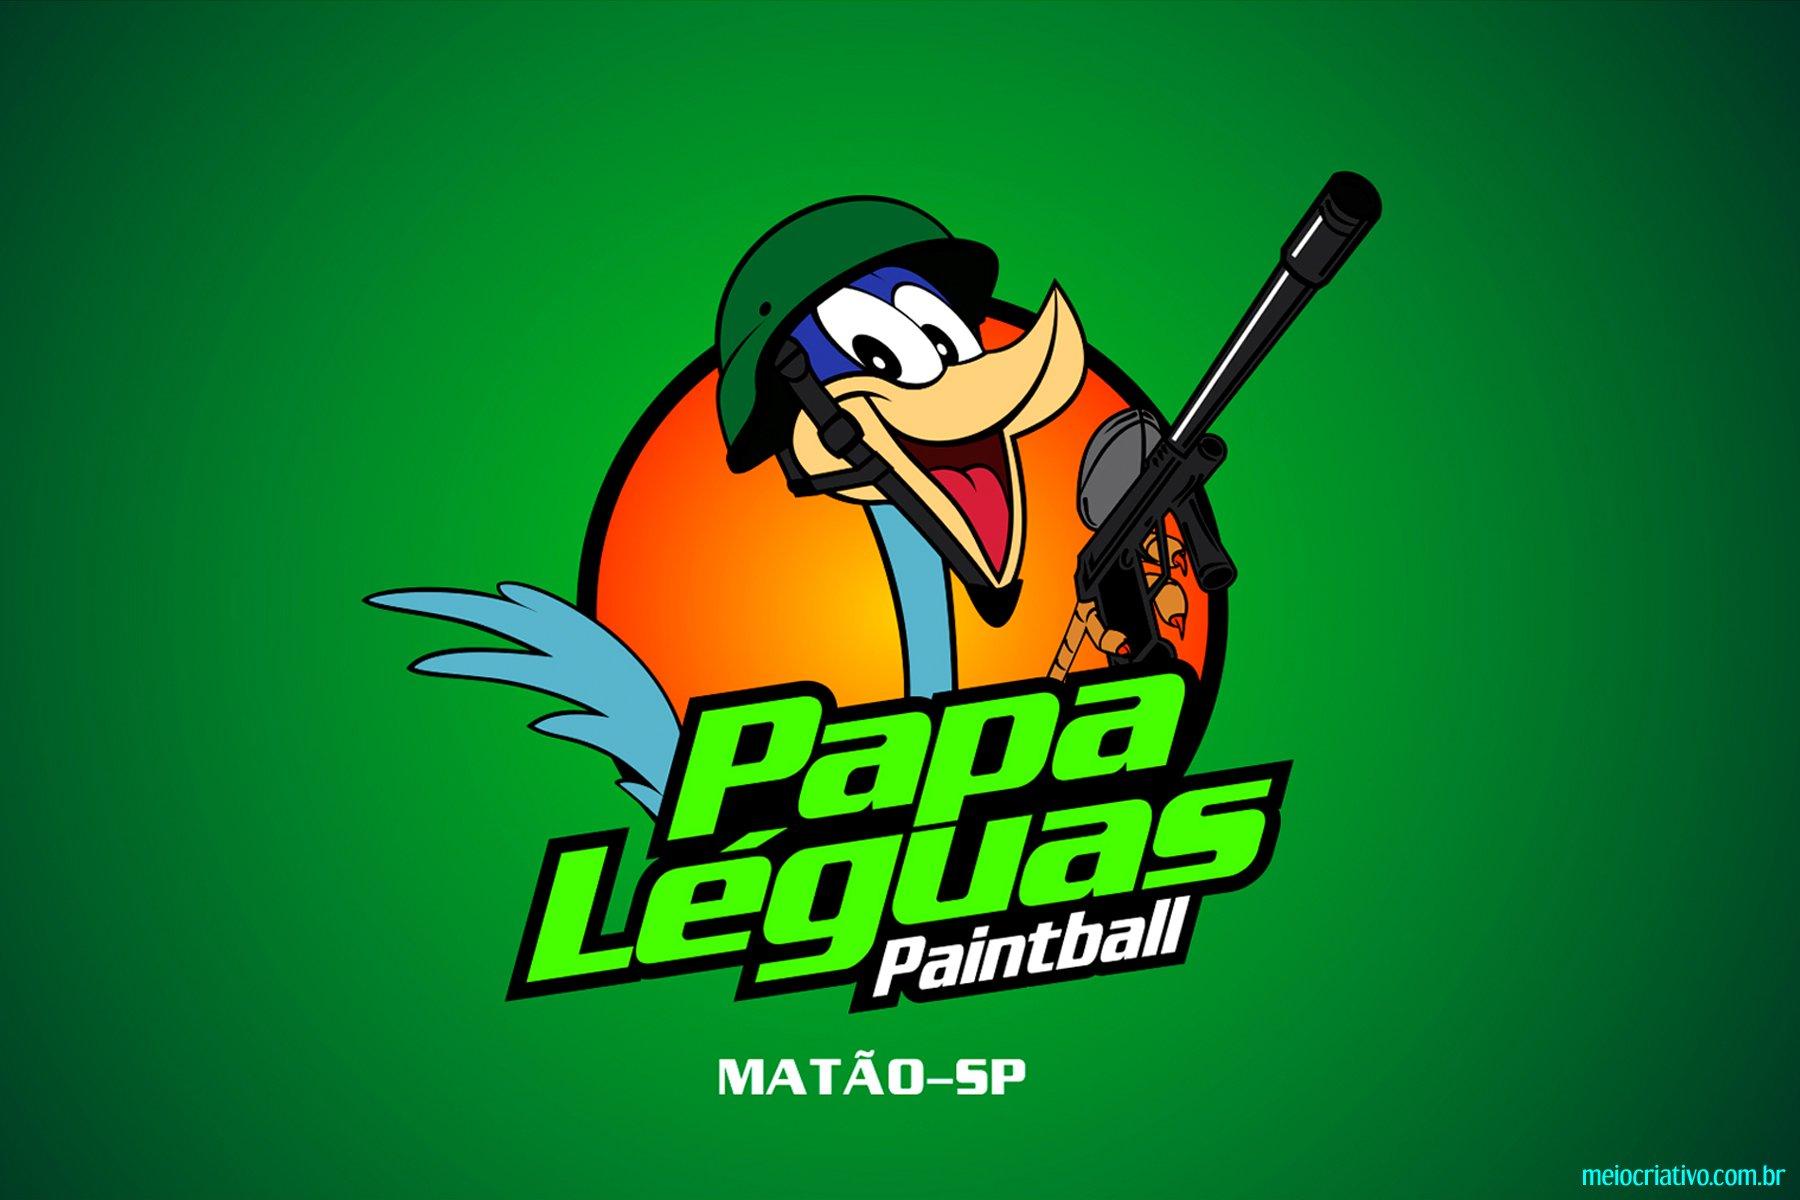 logomarca-papaleguas-paintball